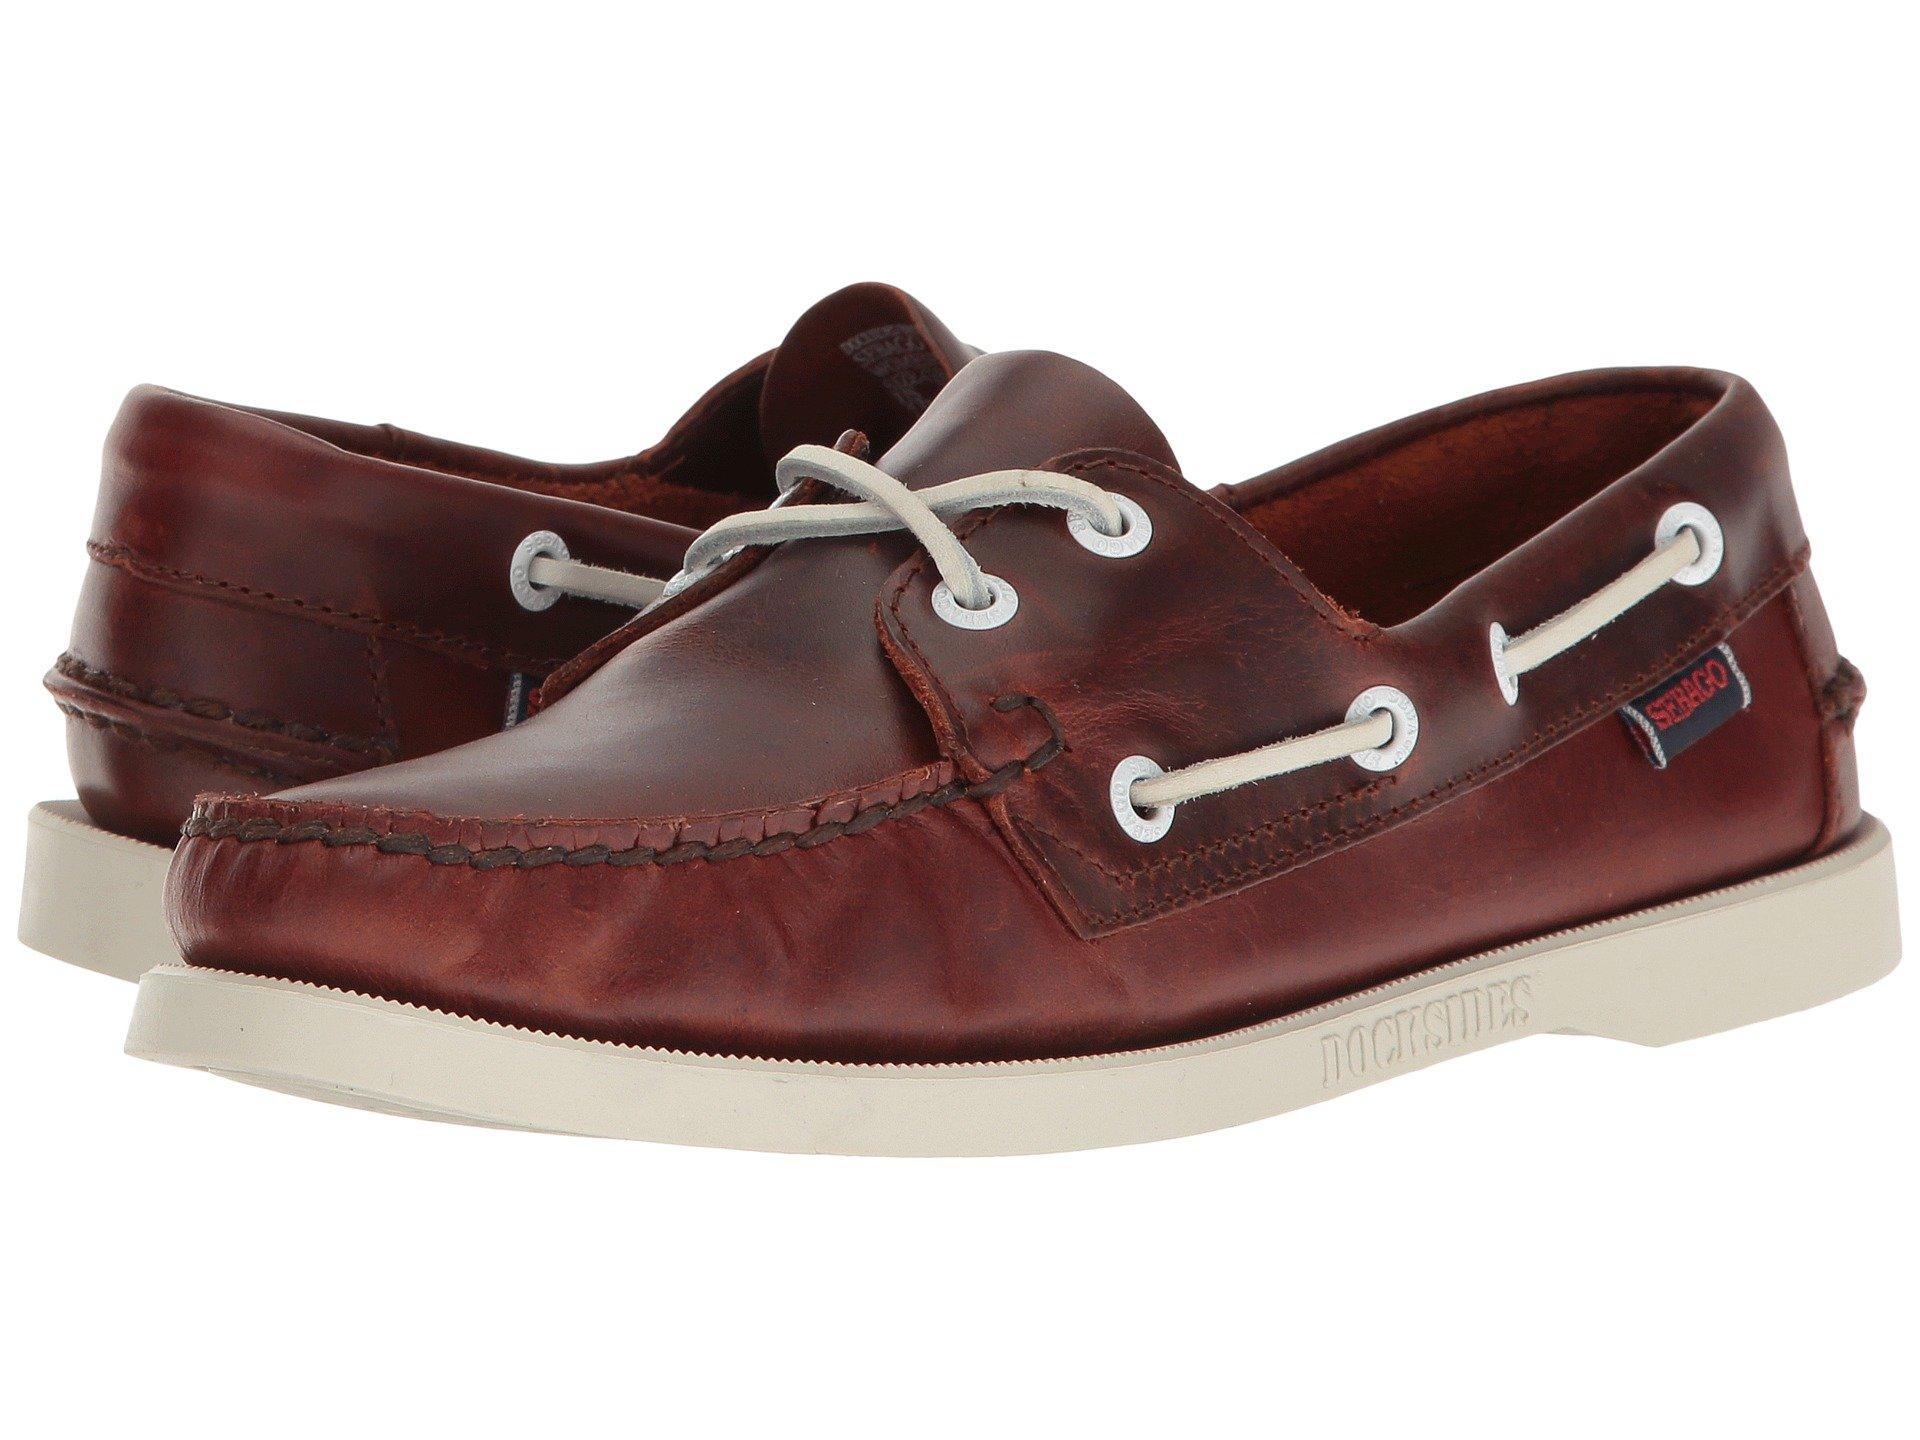 Boat Shoes para Mujer Sebago Docksides® Leather  + Sebago en VeoyCompro.net